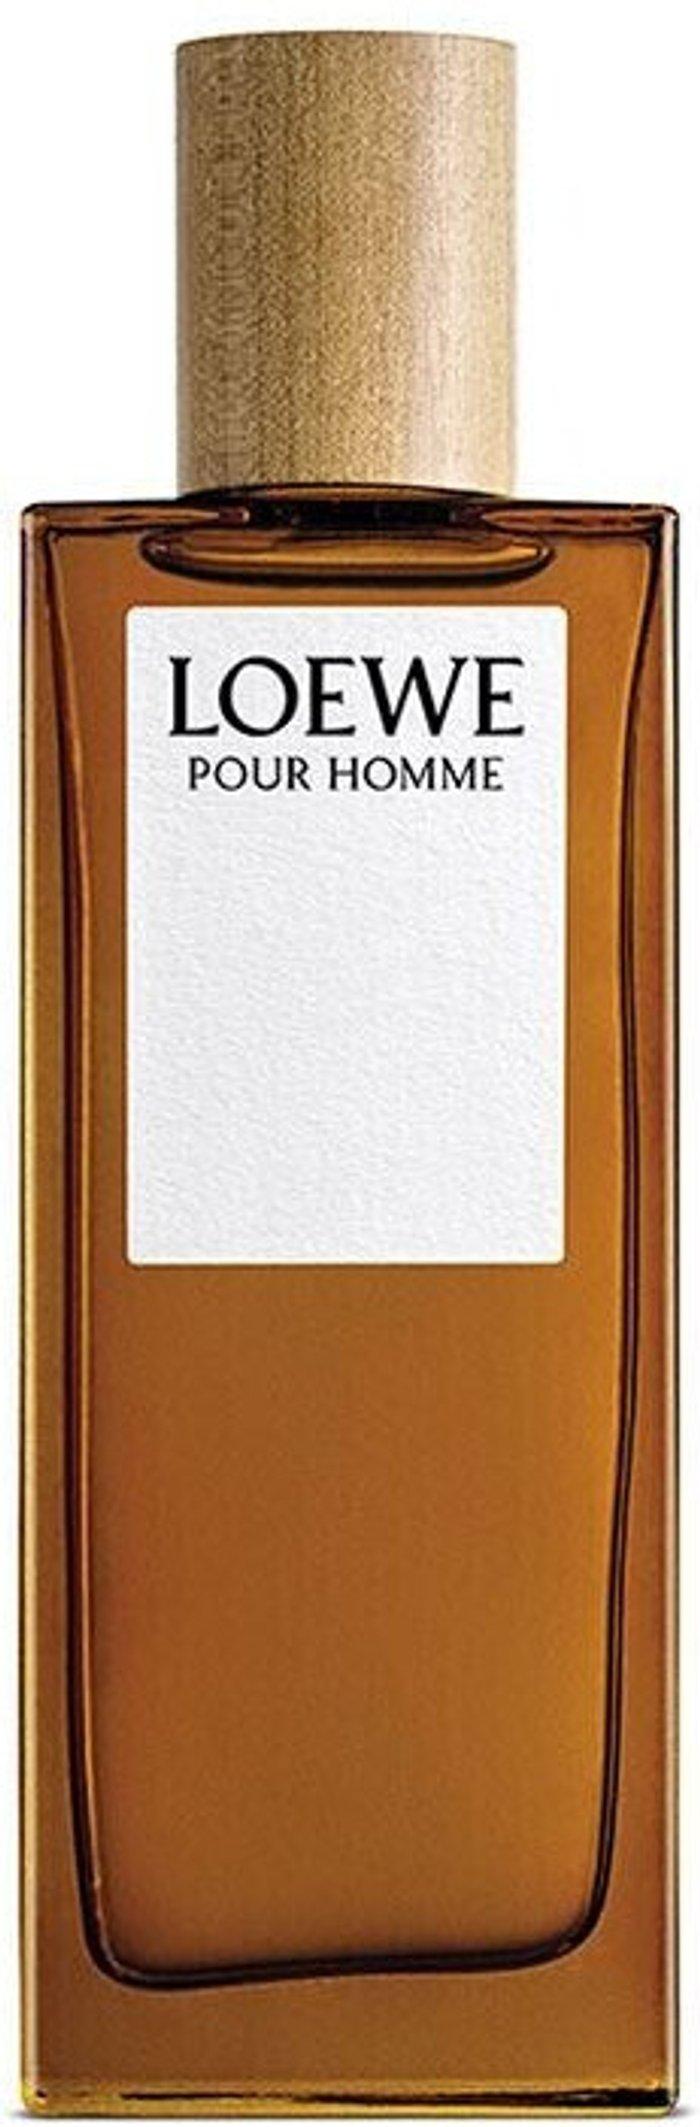 Loewe S.A. Loewe pour Homme Eau de Toilette (50ml)